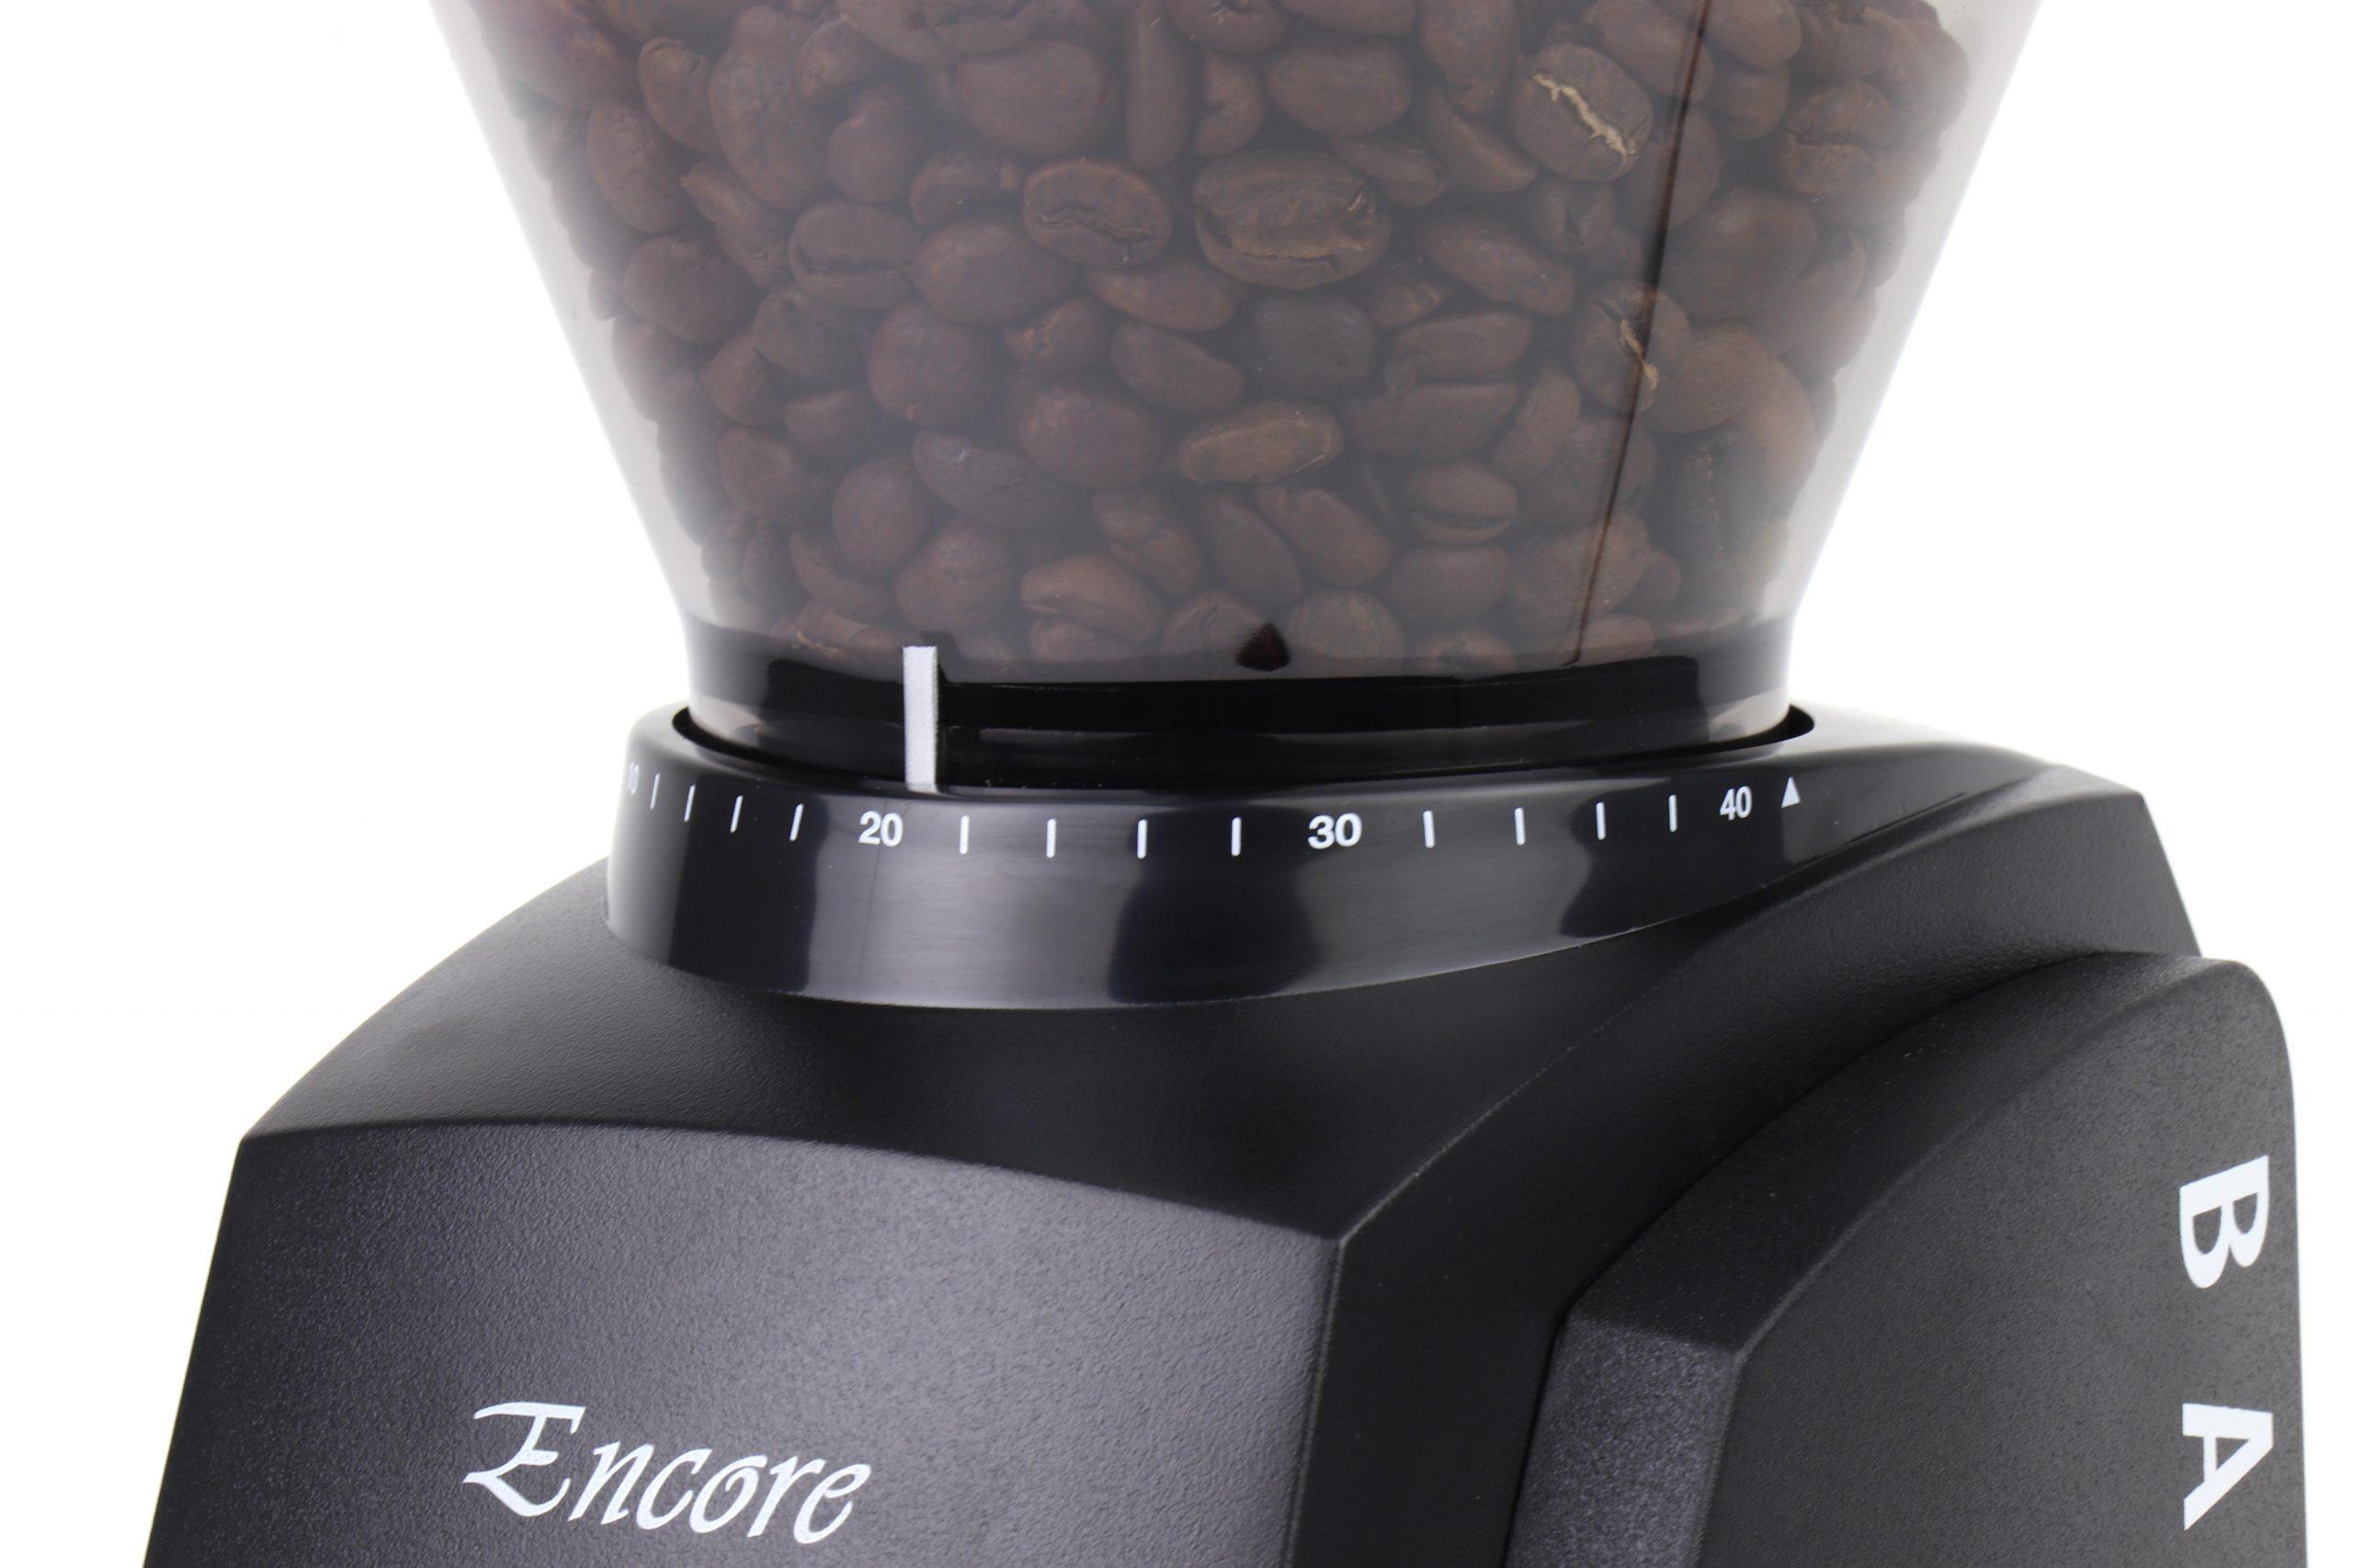 Baratza Encore Coffee Grinder - Black (2020 Update)